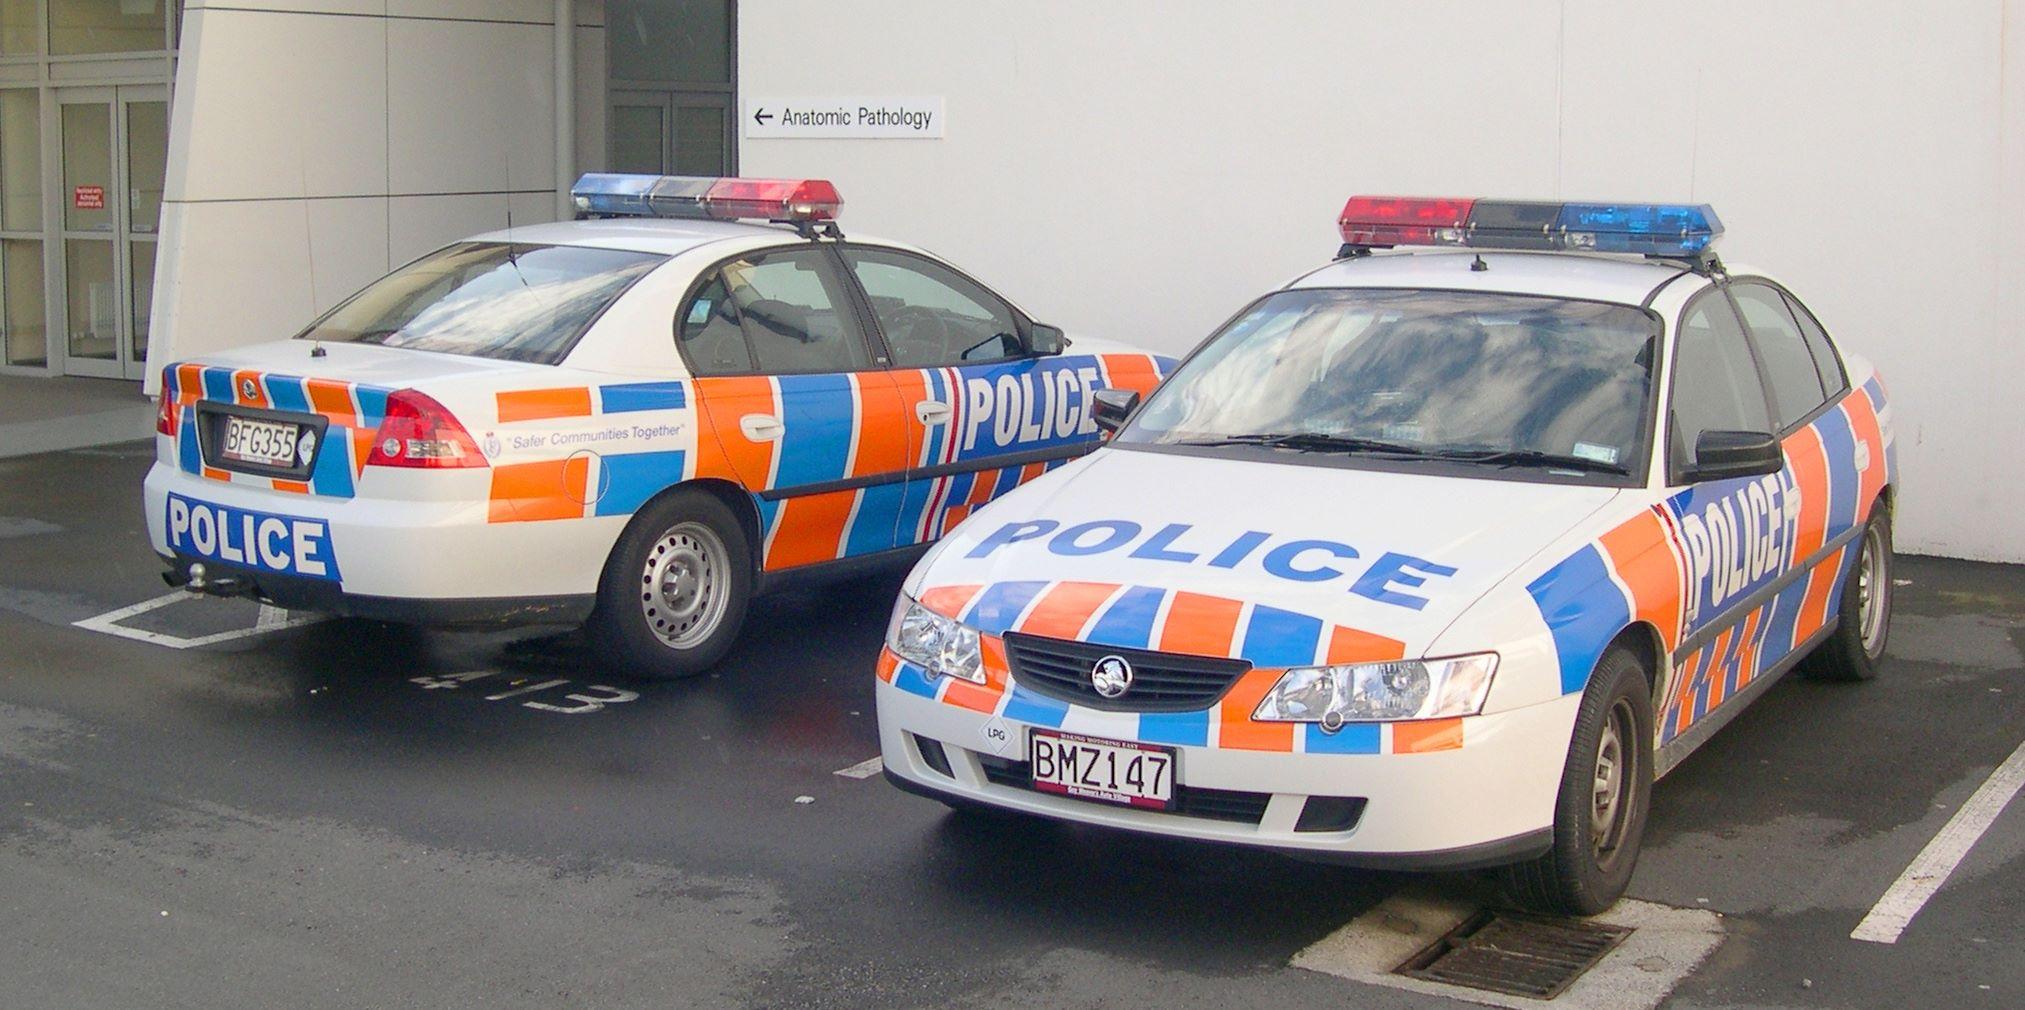 File2002 2003 holden vy commodore executive sedans new zealand file2002 2003 holden vy commodore executive sedans new zealand police 01 vanachro Gallery